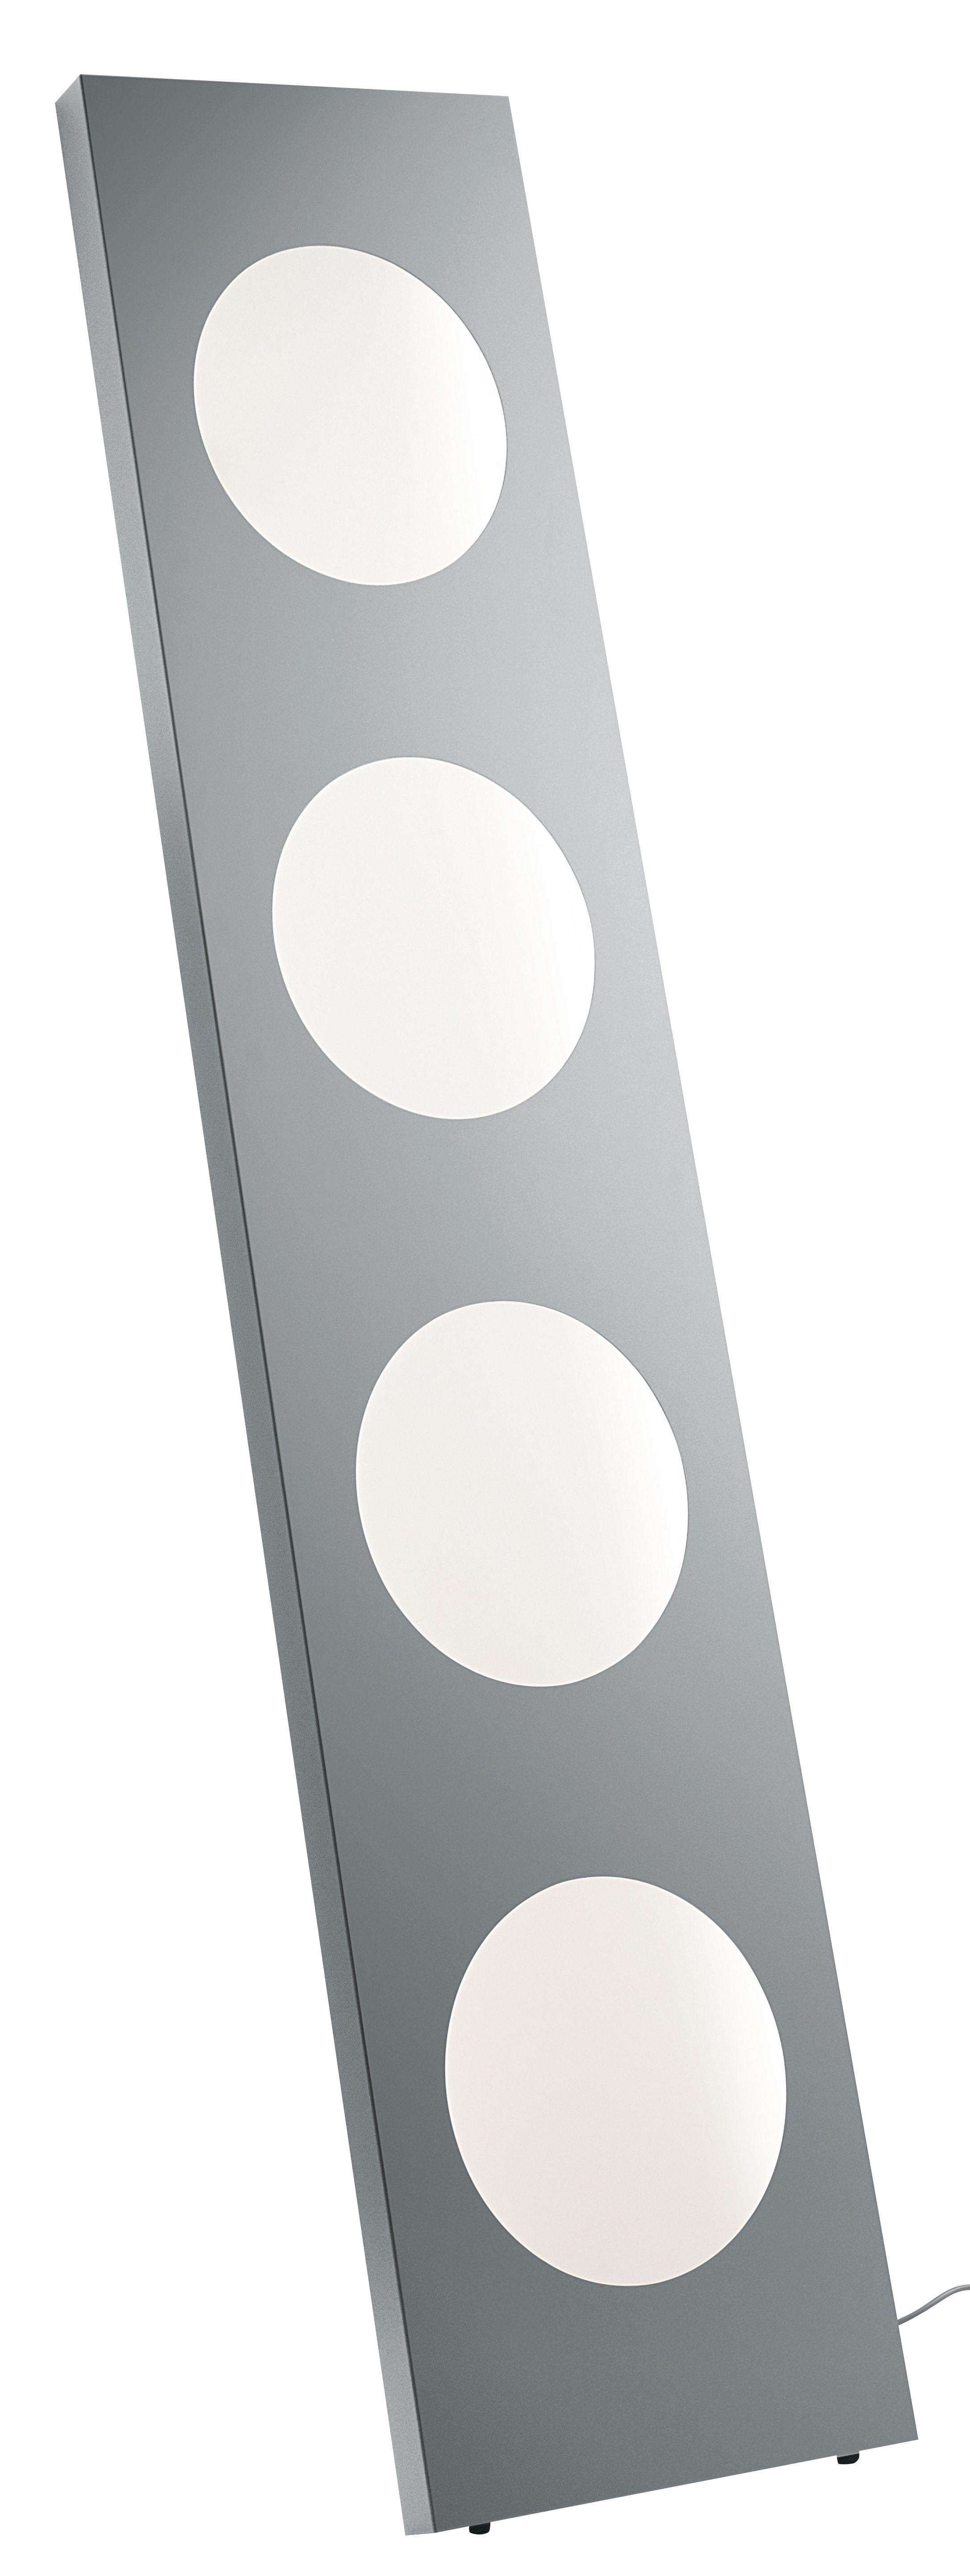 Illuminazione - Lampade da terra - Lampada a stelo Dolmen - LED / L 40 x H 180 cm di Foscarini - Alluminio - Aluminiu anodisé, PMMA